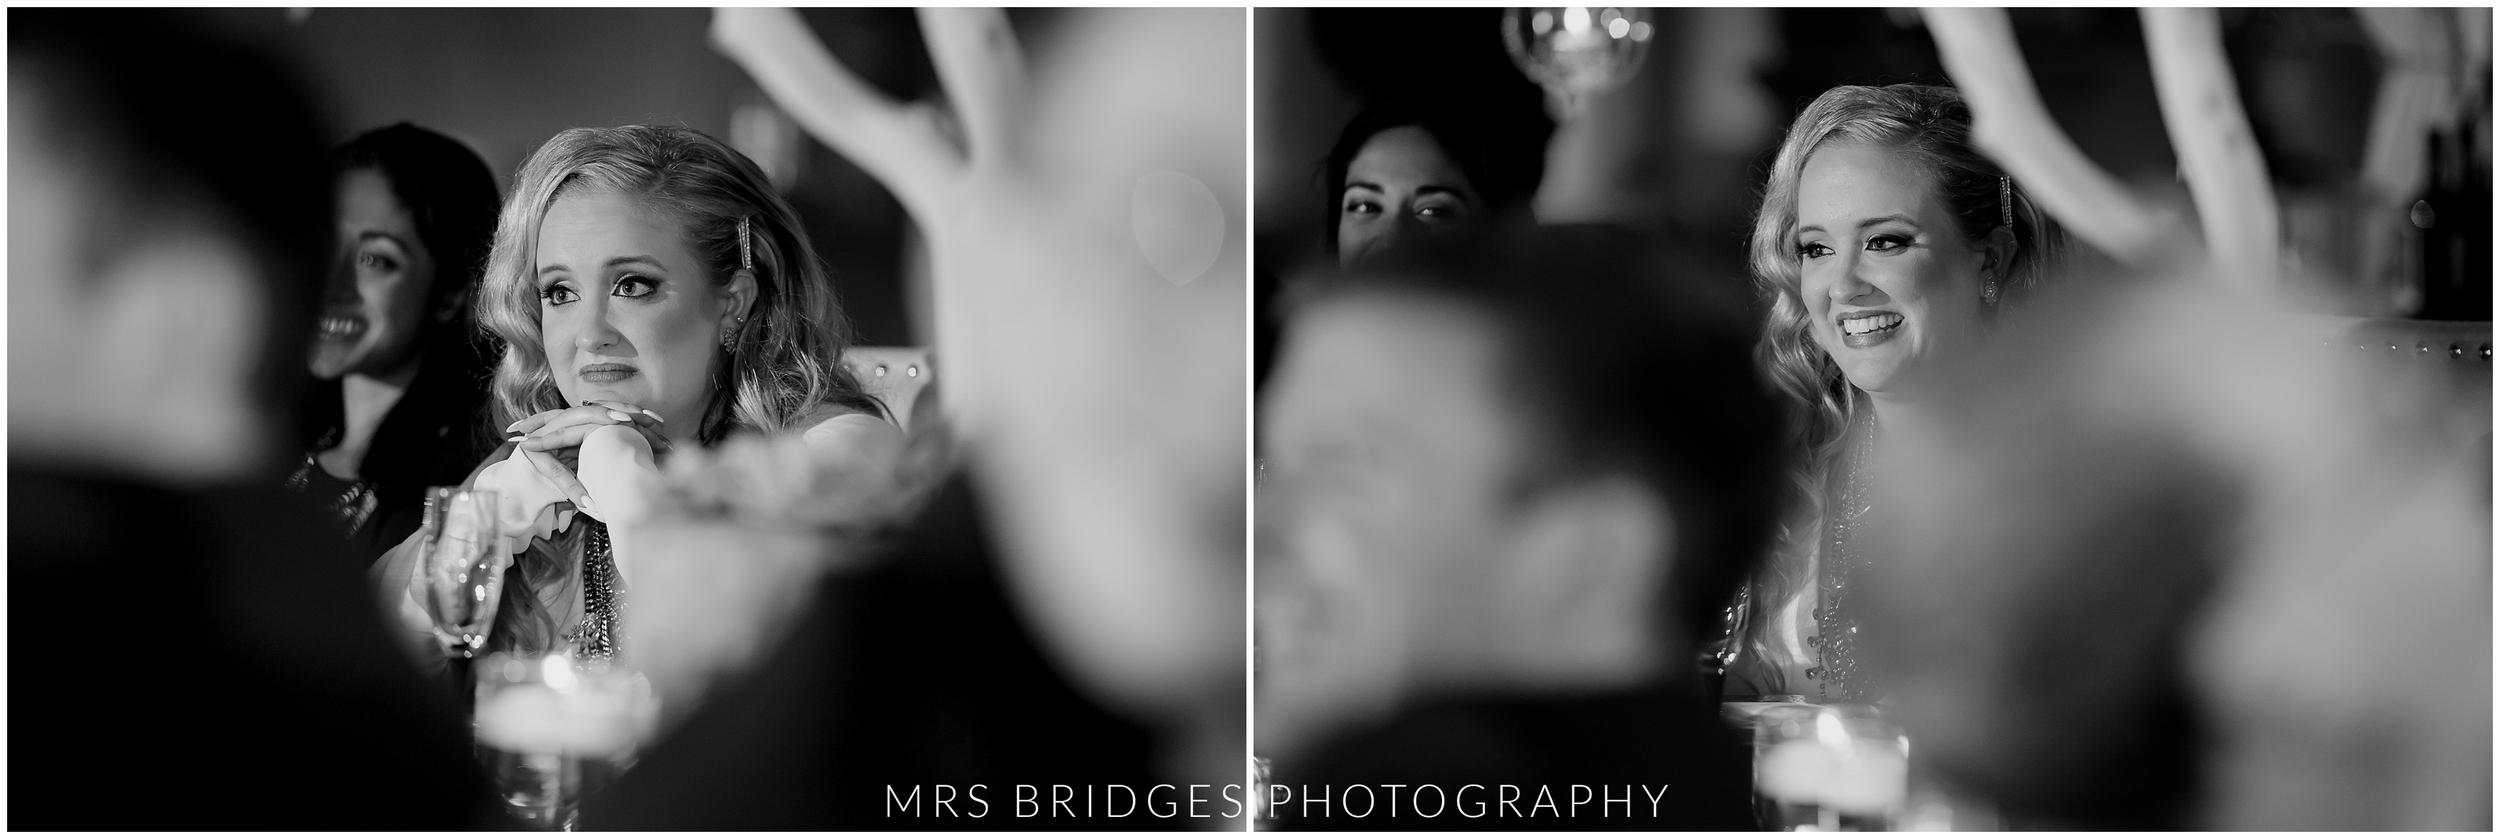 Rebecca_Bridges_Photography__3109.jpg